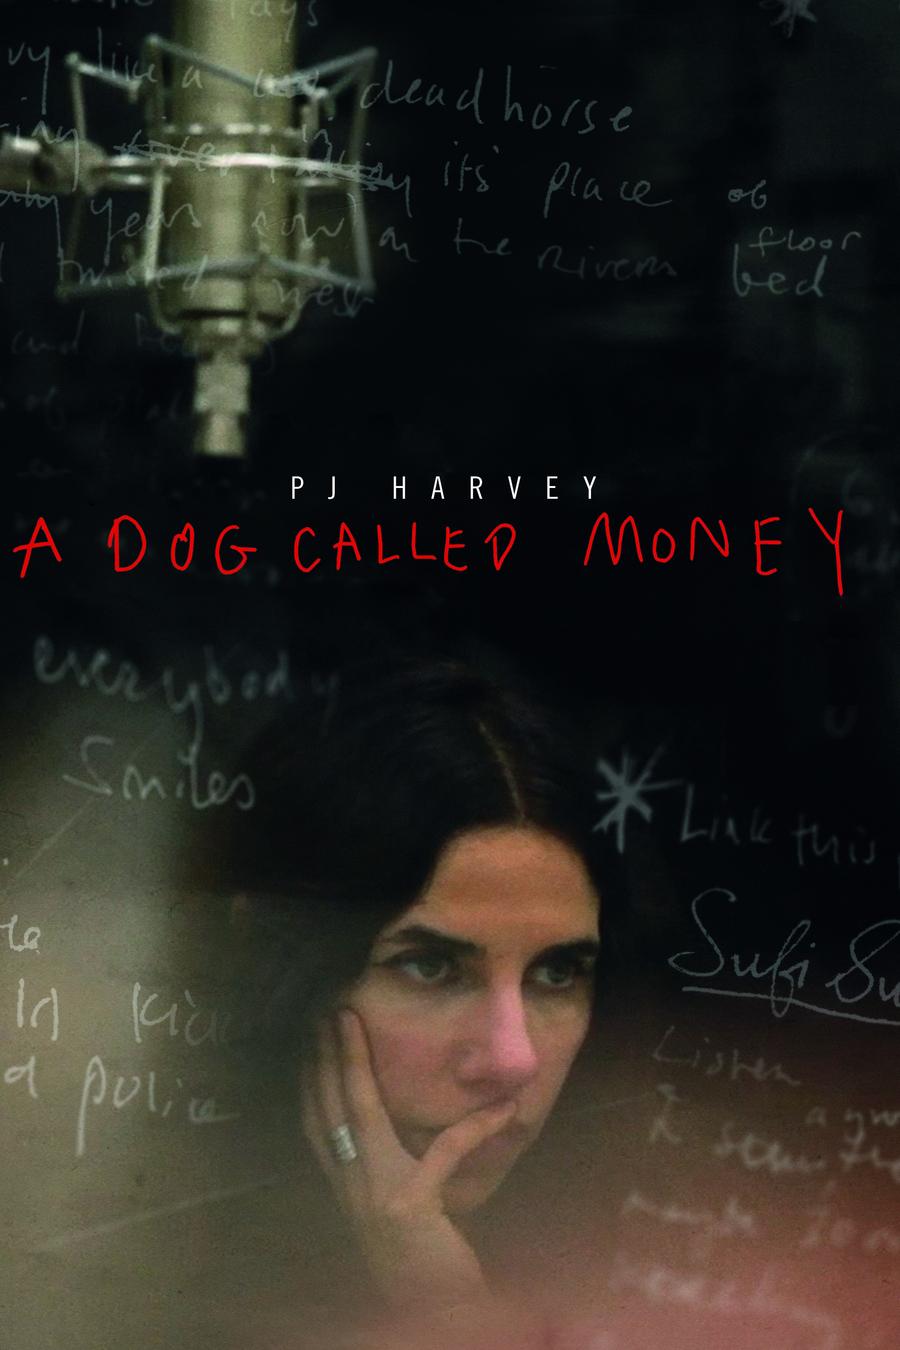 PJ Harvey: A Dog Called Money